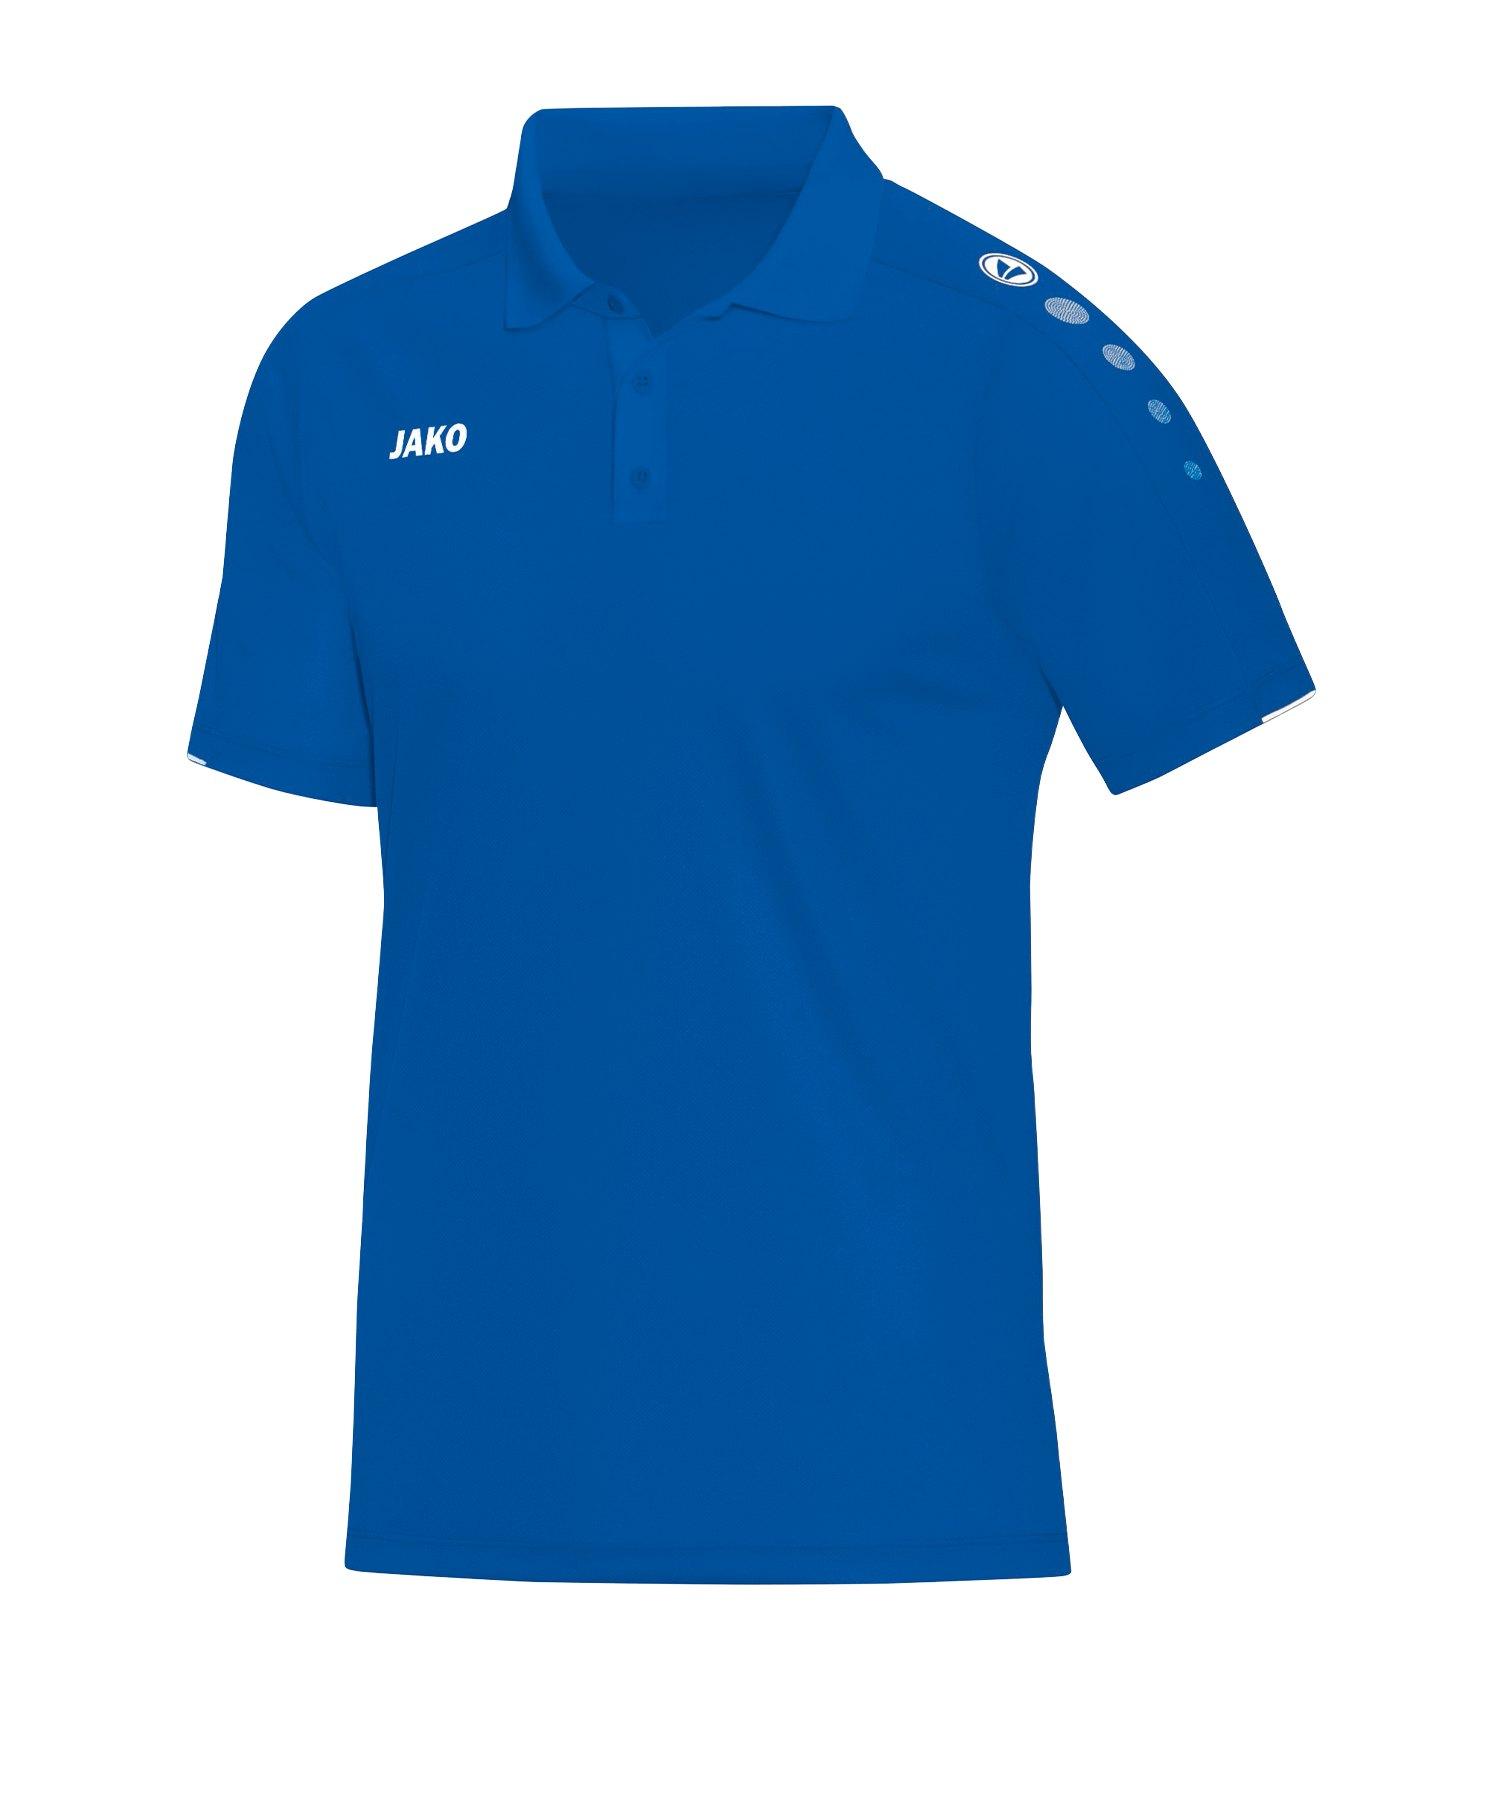 Jako Classico Poloshirt Damen Blau F04 - Blau